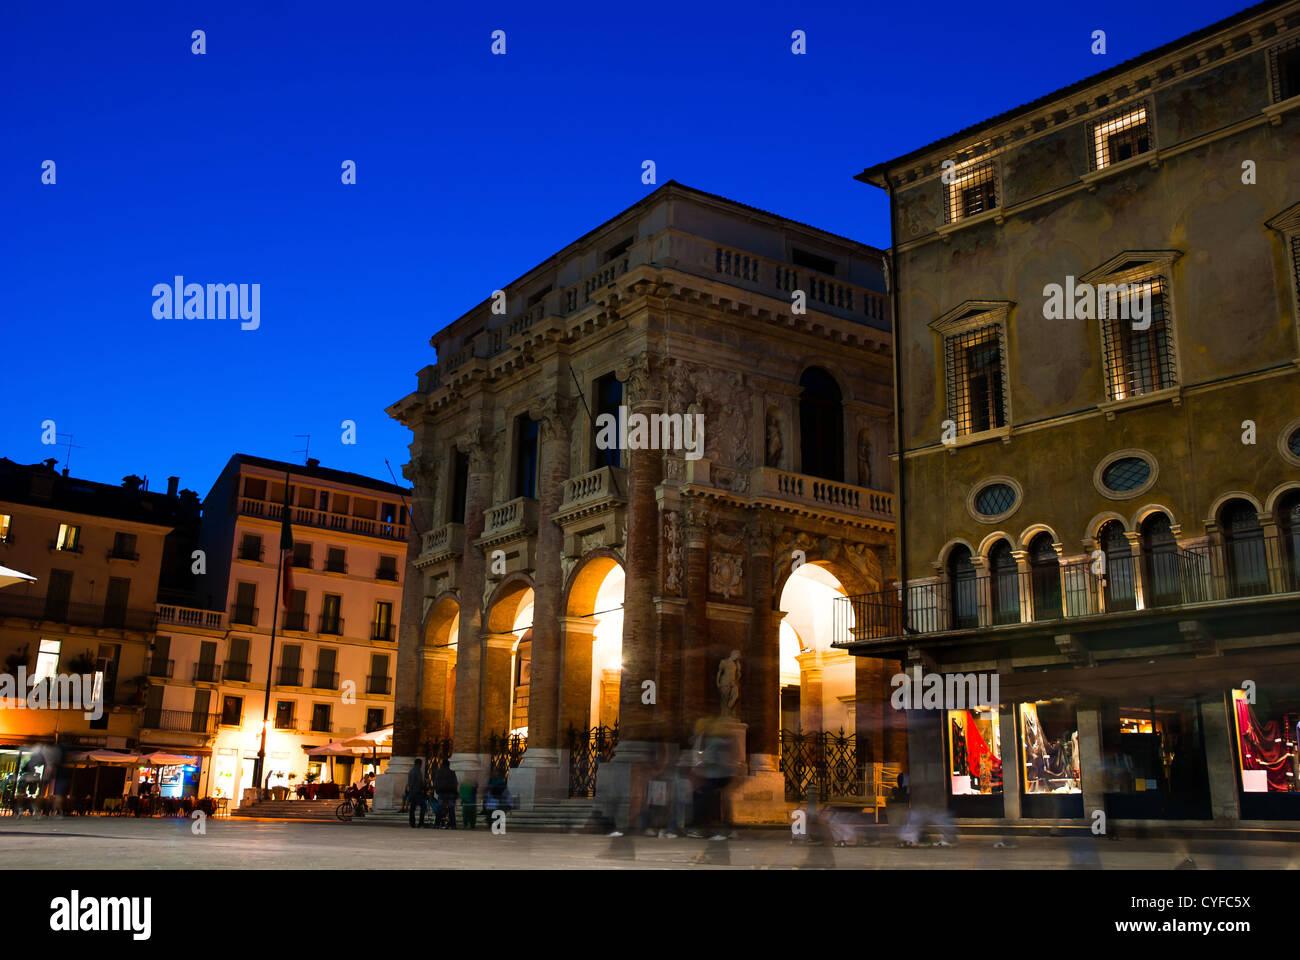 The palazzo del Capitaniato, also known as loggia del Capitanio or loggia Bernarda, is a palazzo in Vicenza, northern - Stock Image